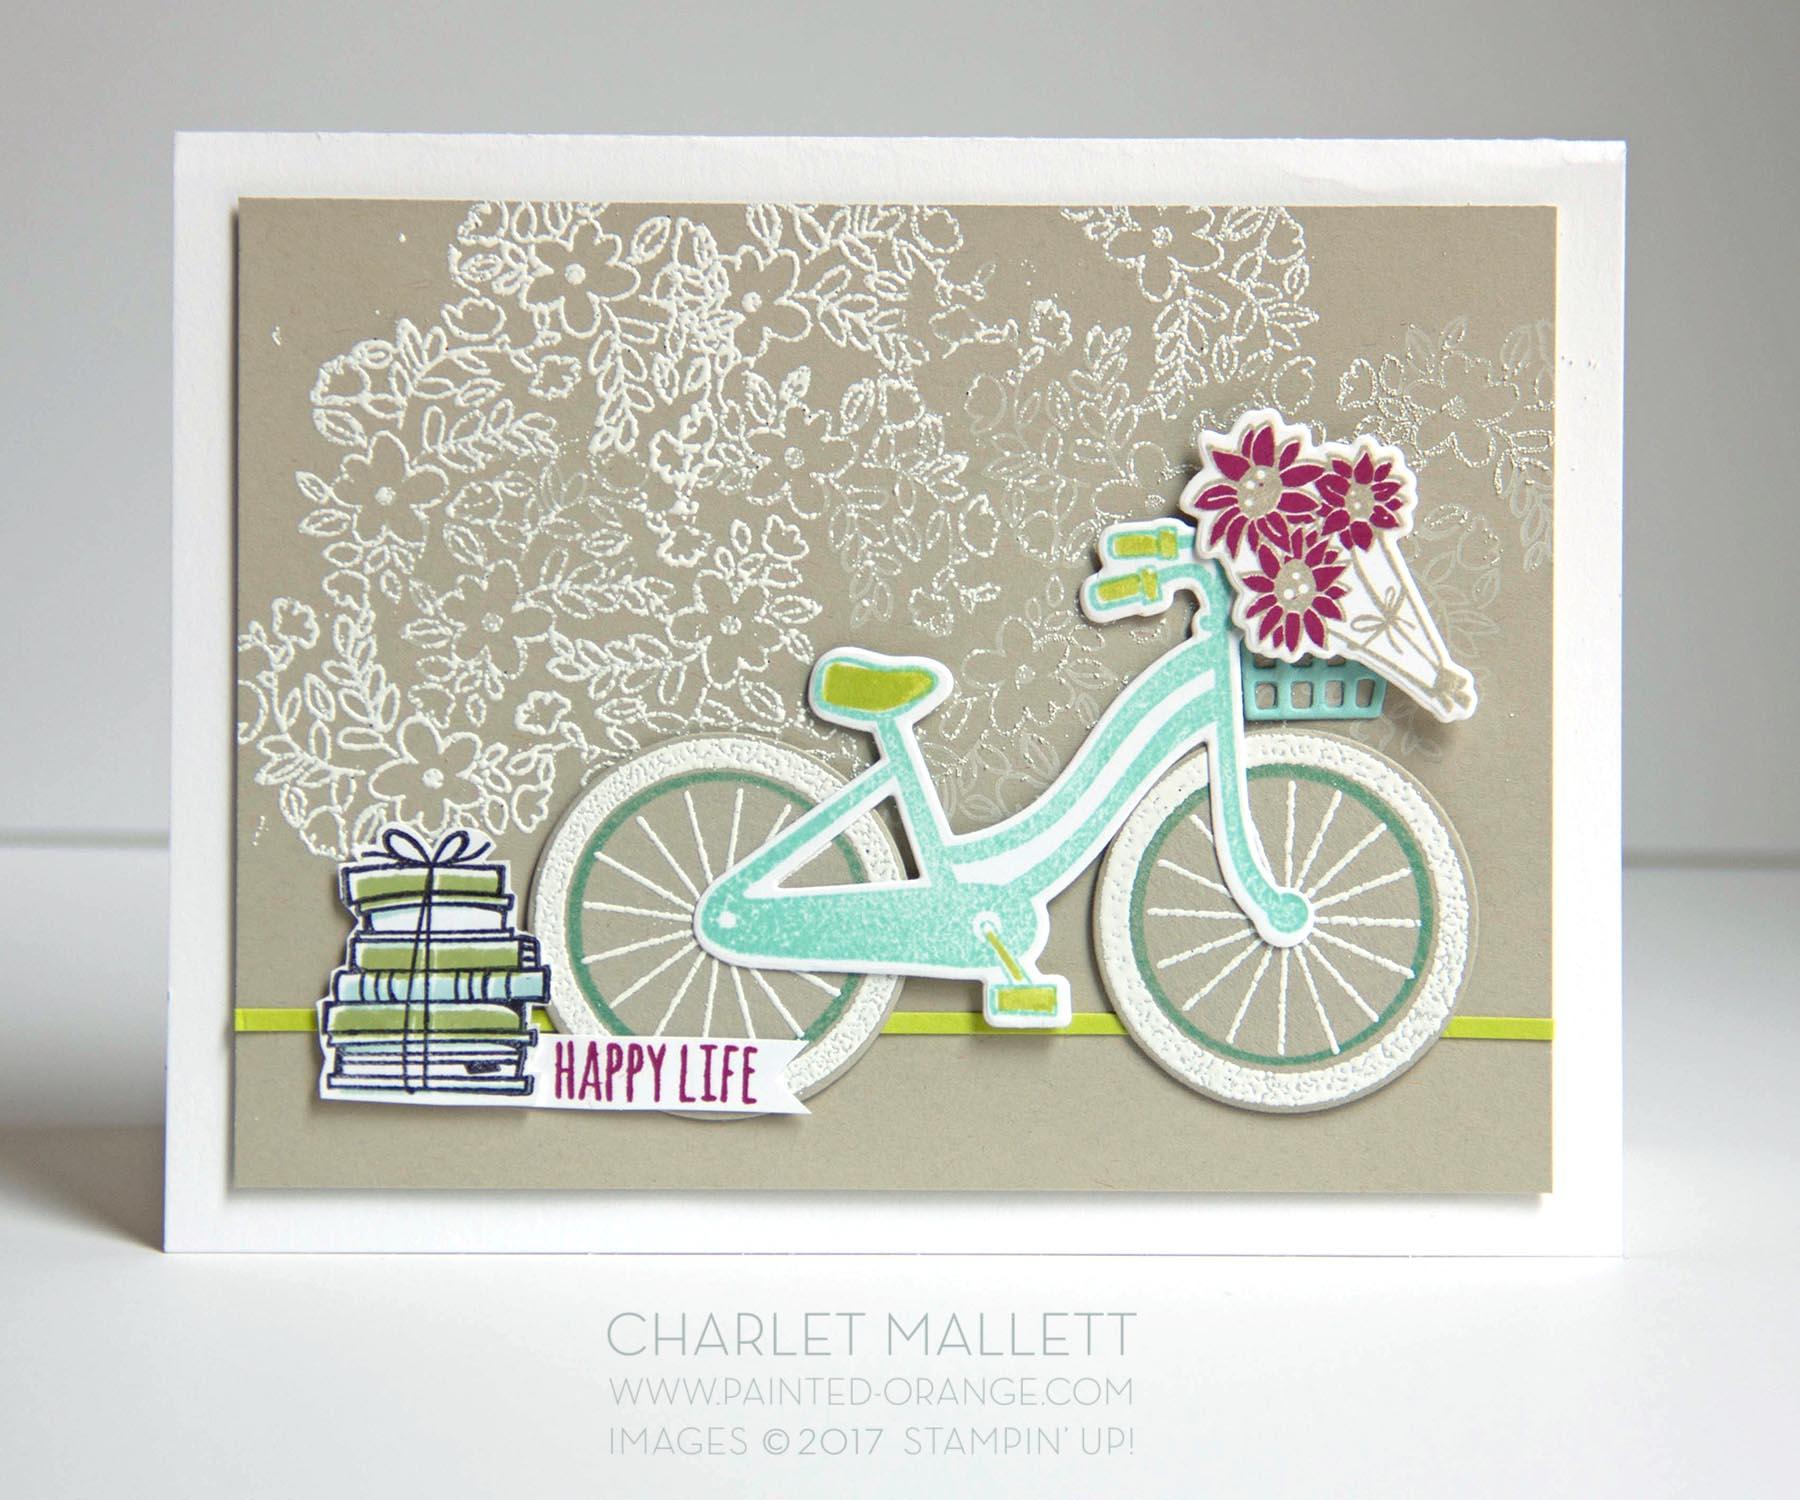 Bike Ride - Charlet Mallett, Stampin' Up!